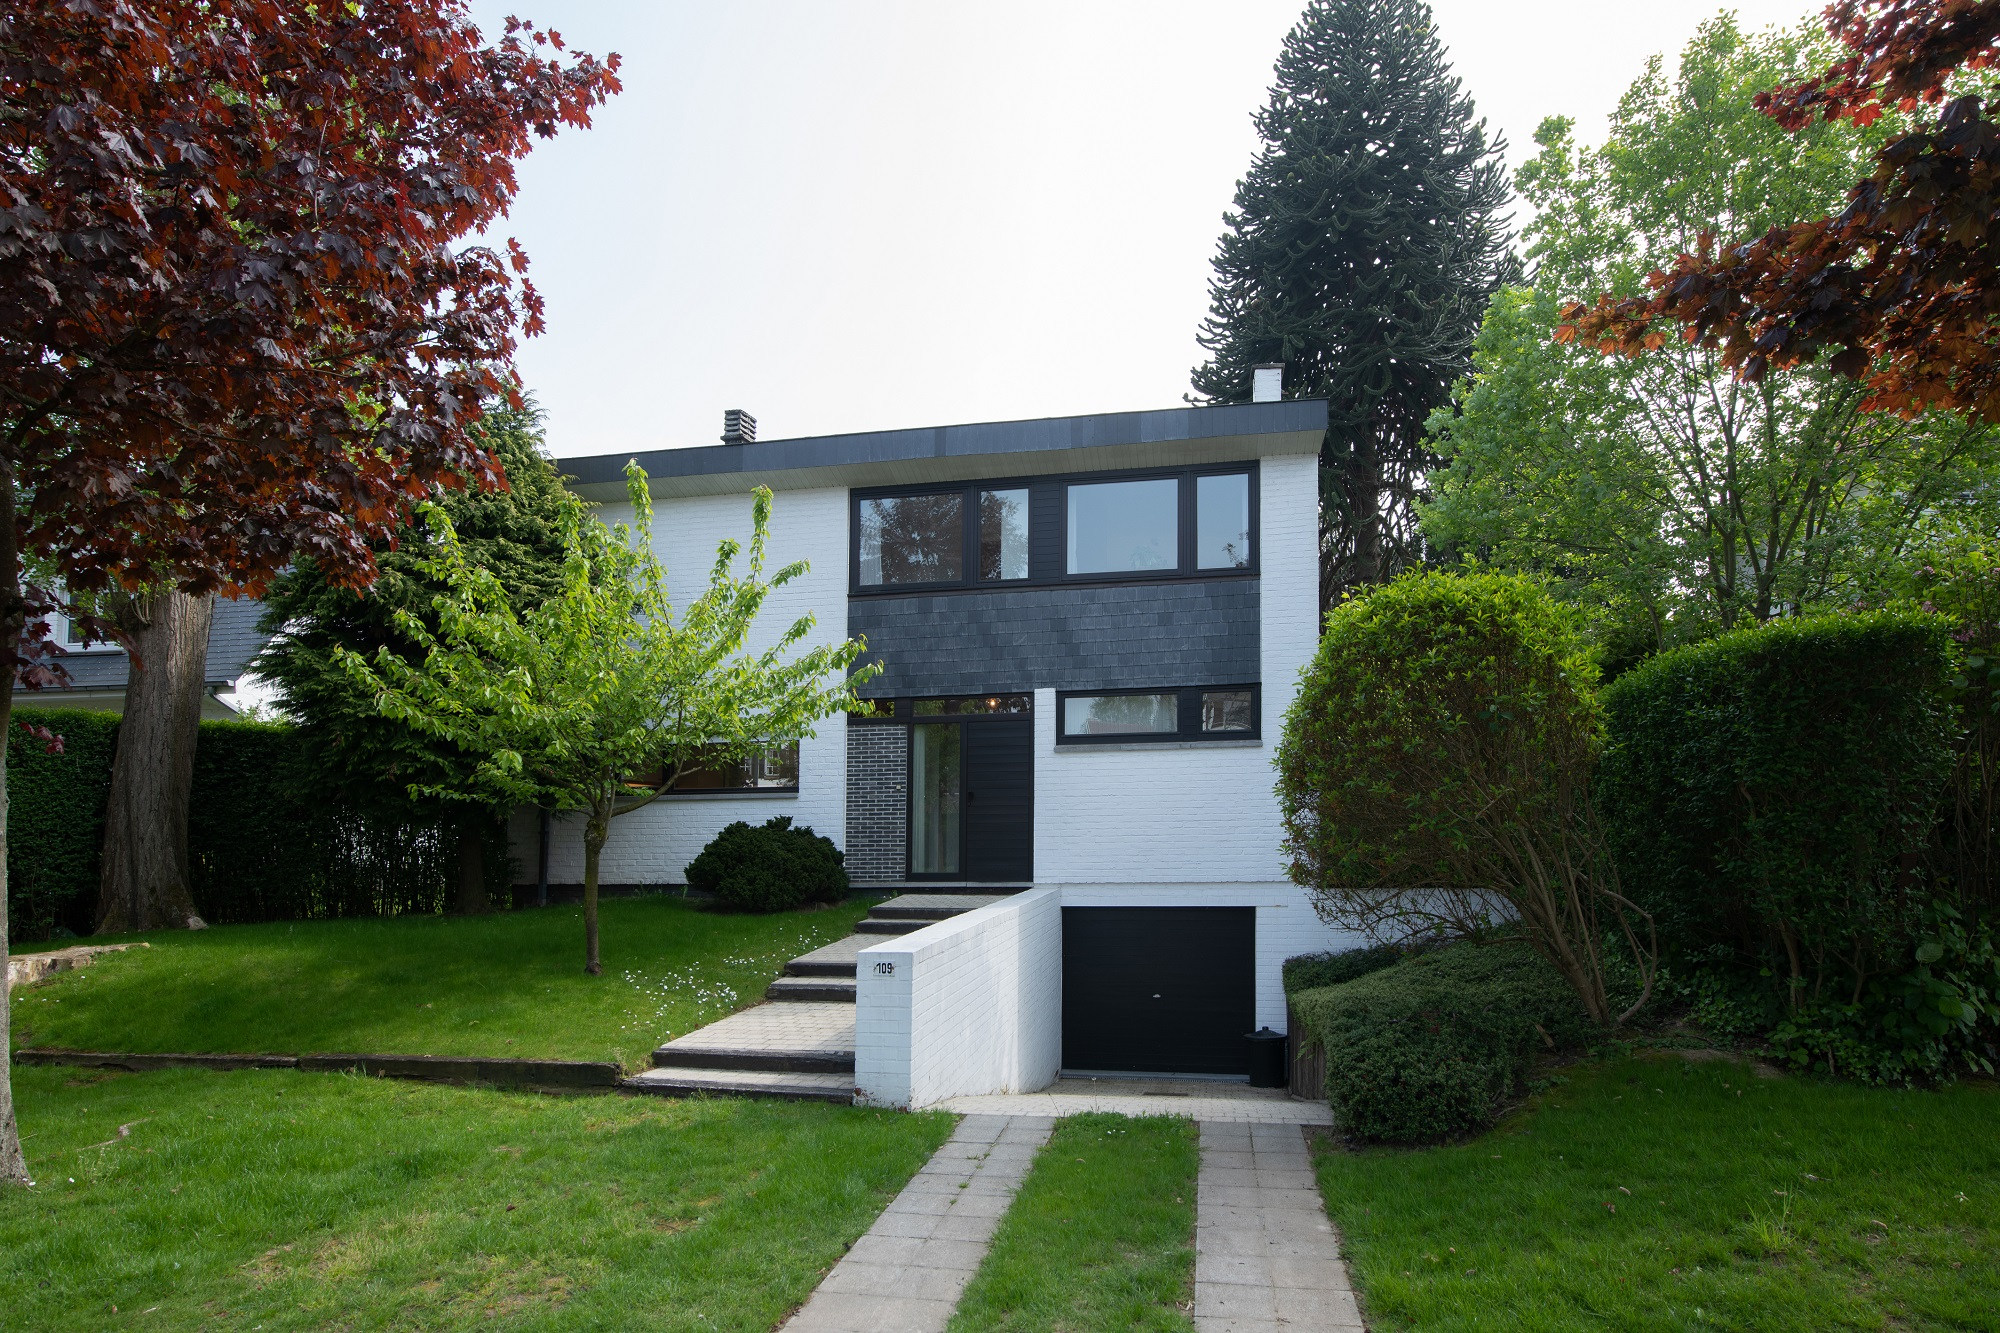 Splendide villa d'architecte 4 façades 3 chs terrasse&jardin plein sud garage